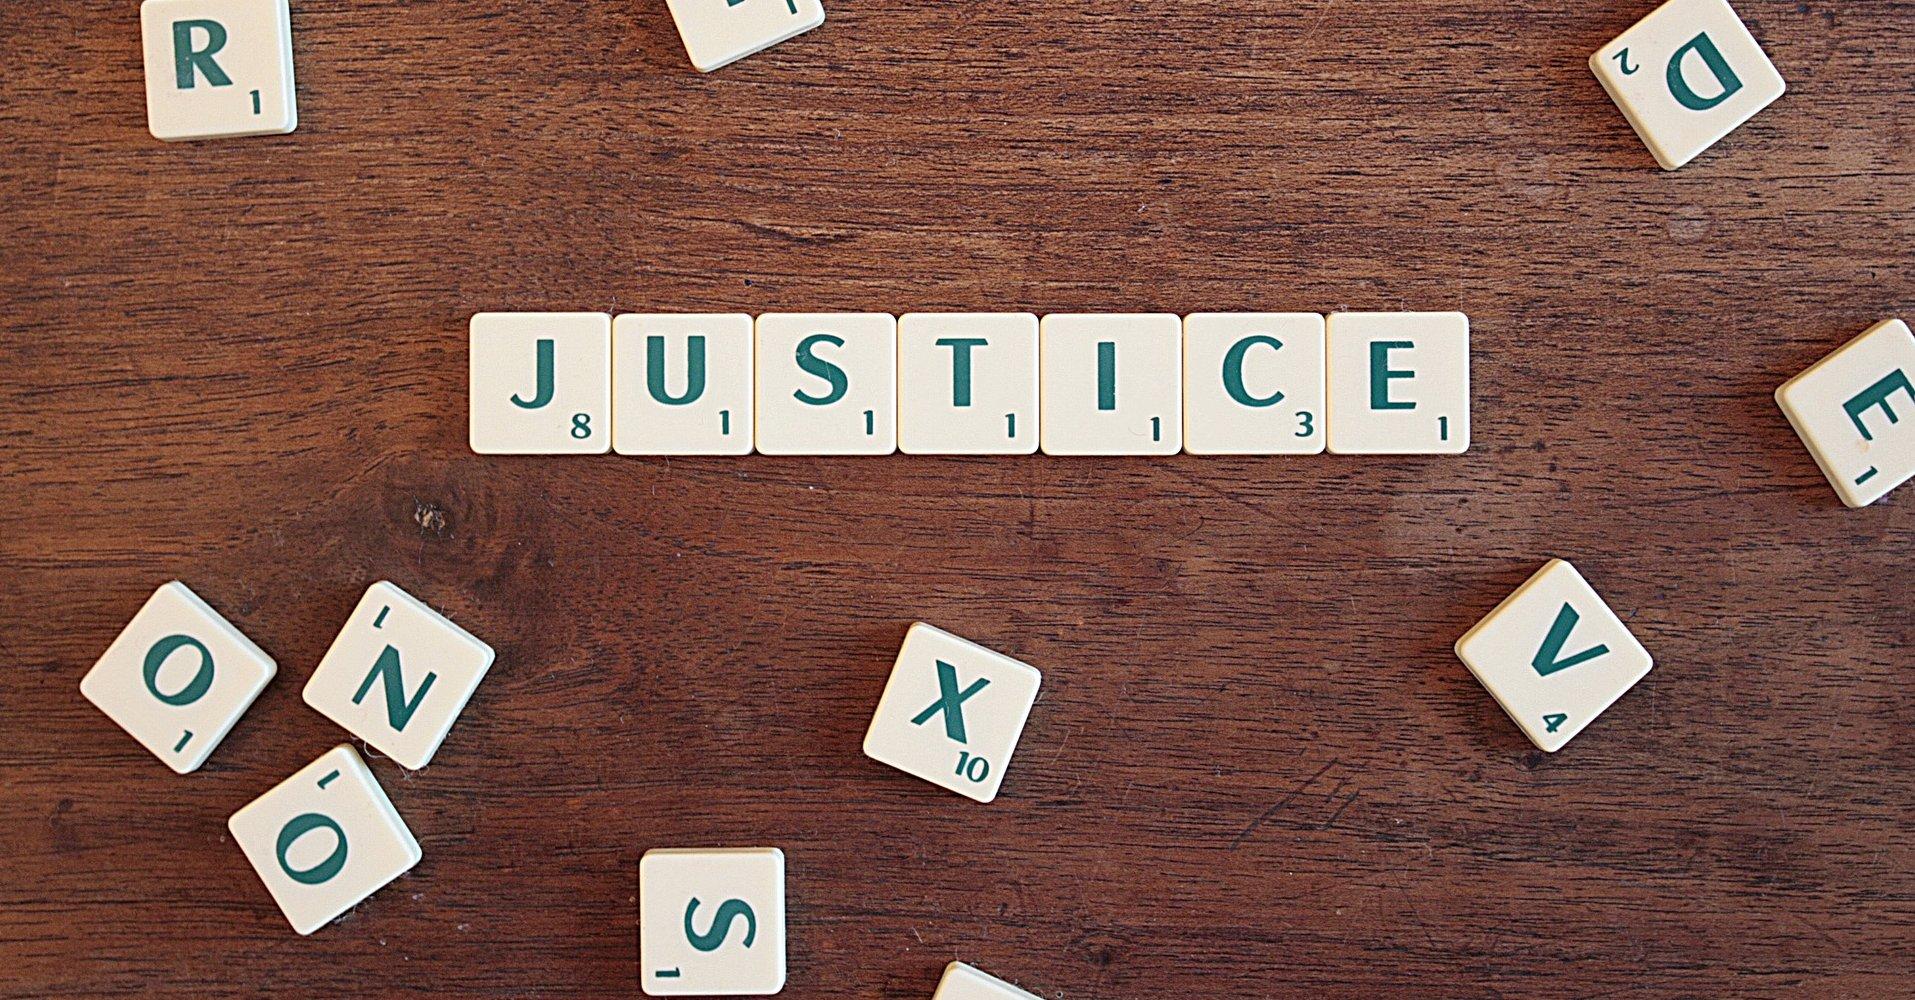 Ralli Ltd: Justice for David? Banner